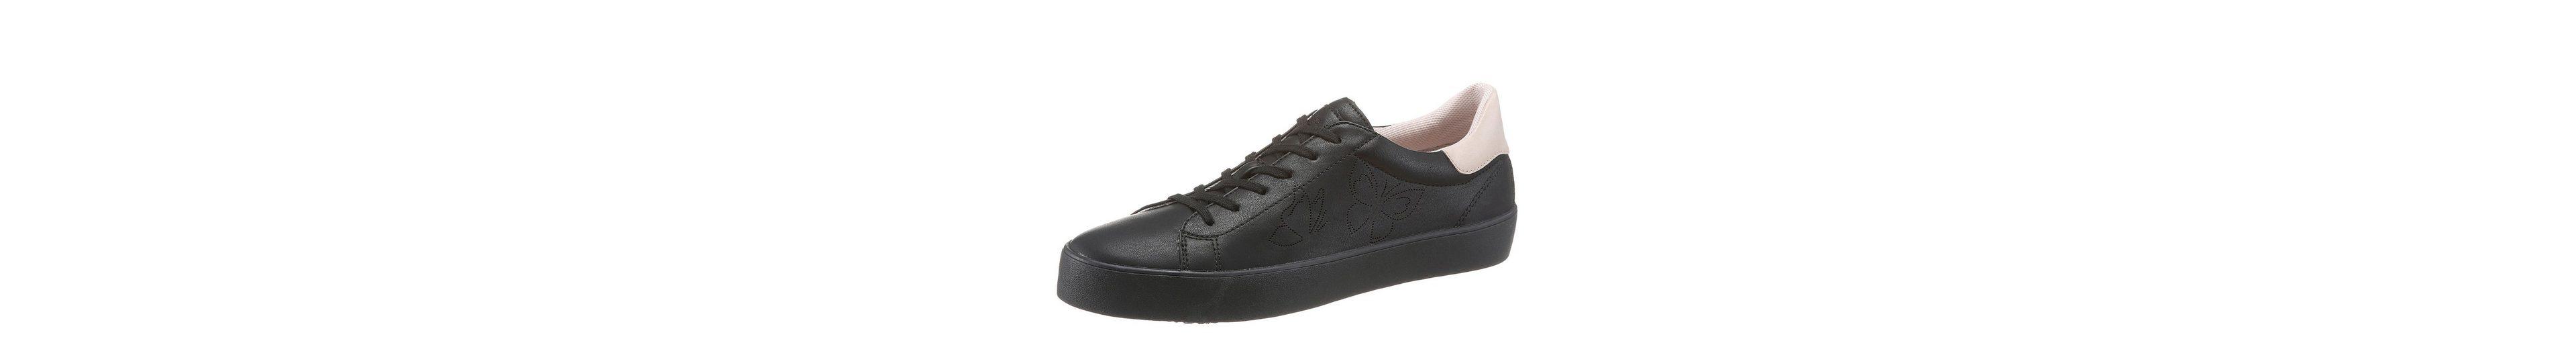 ESPRIT Mandy Lace Up Sneaker, mit andersfarbigem Fersendetail